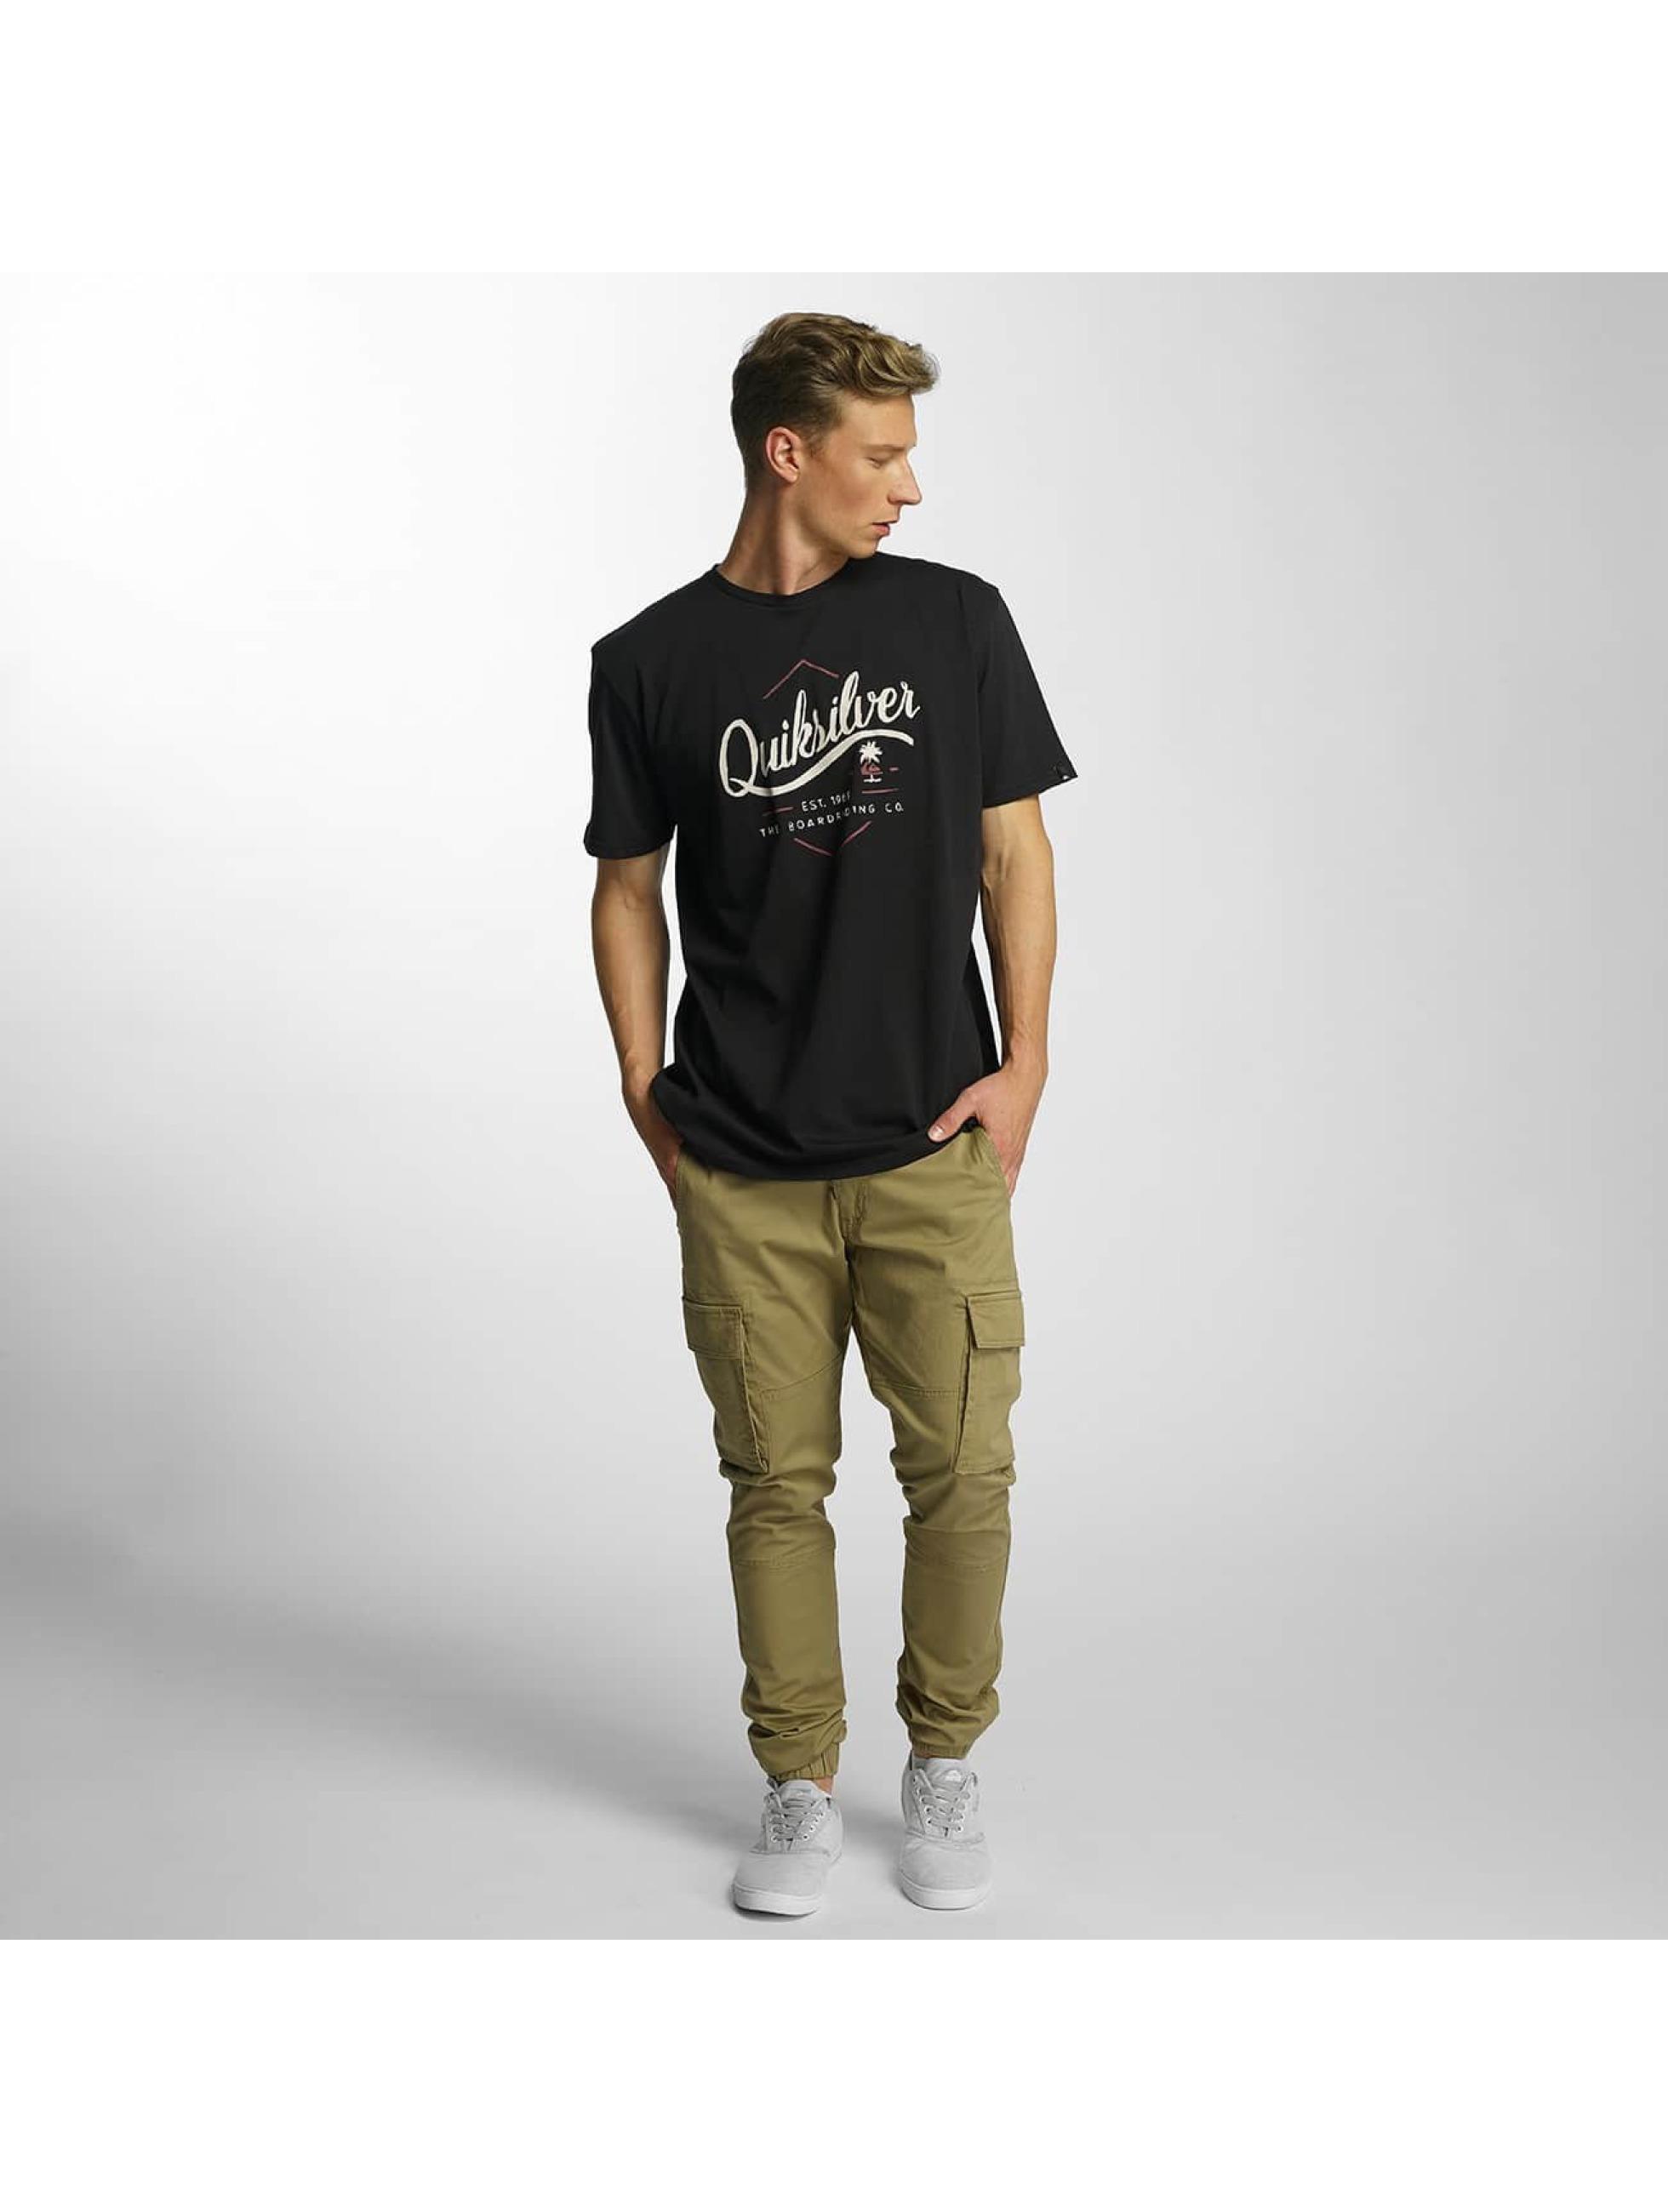 Quiksilver T-Shirt Classic Sea Tales schwarz